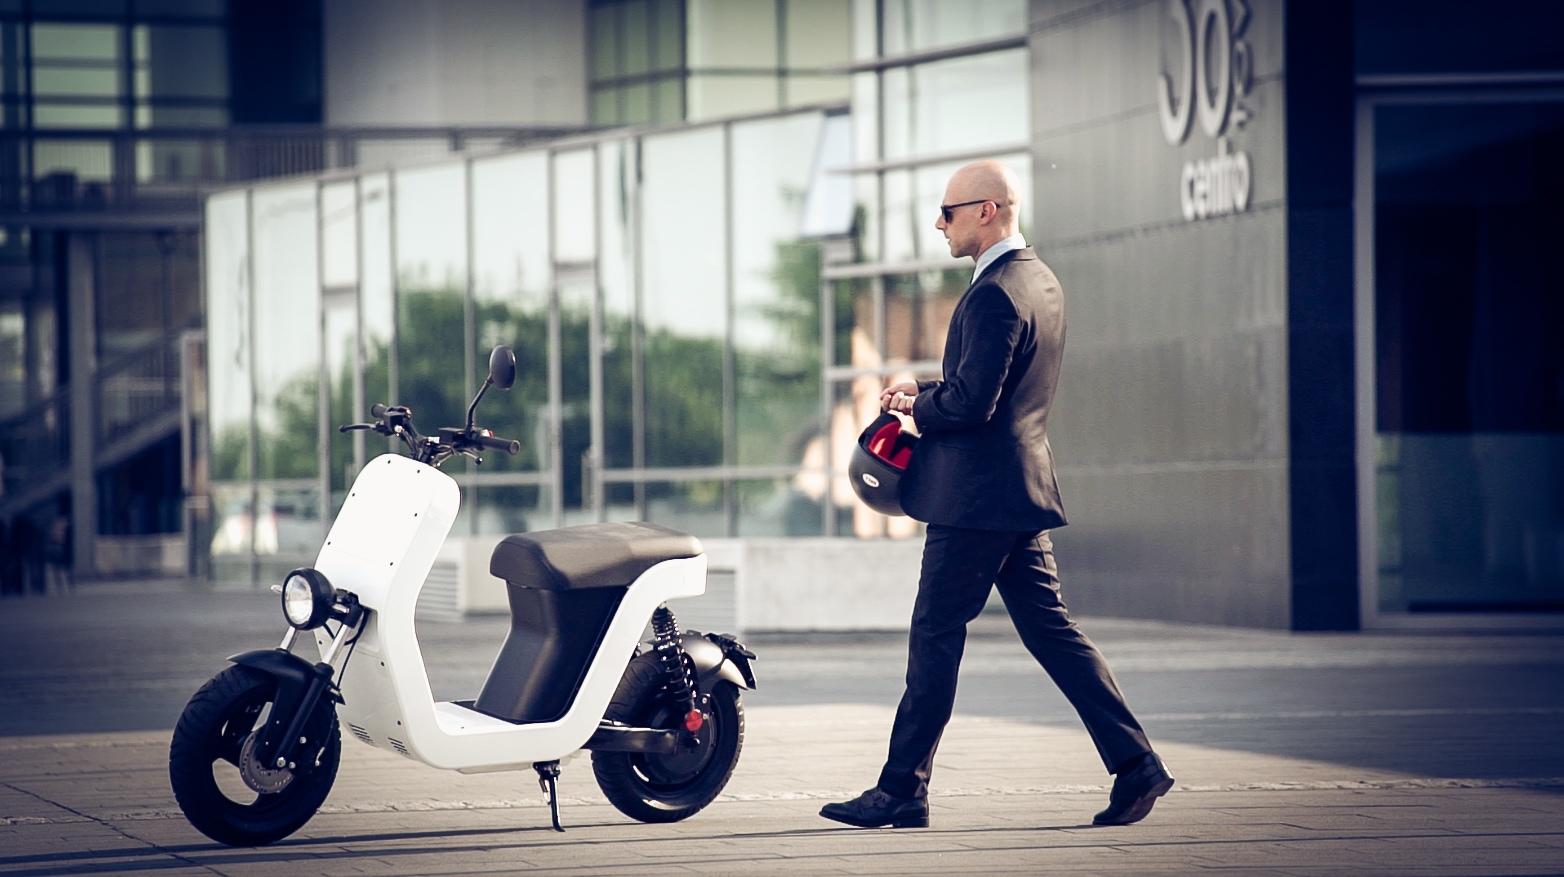 Me Scooter in città